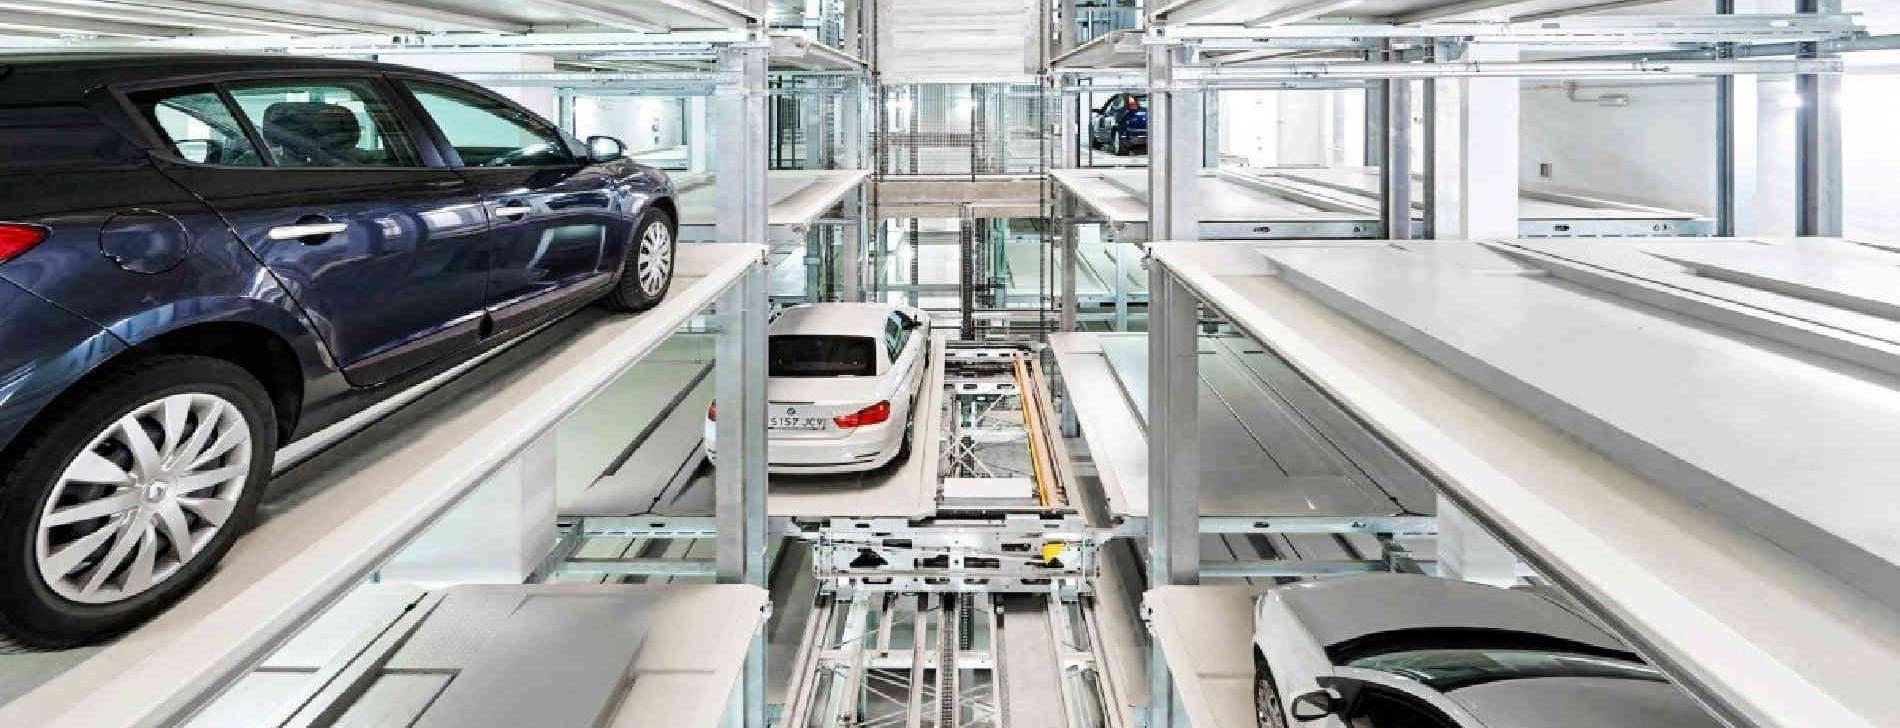 Carparkers Parkeersystemen Automatisch1